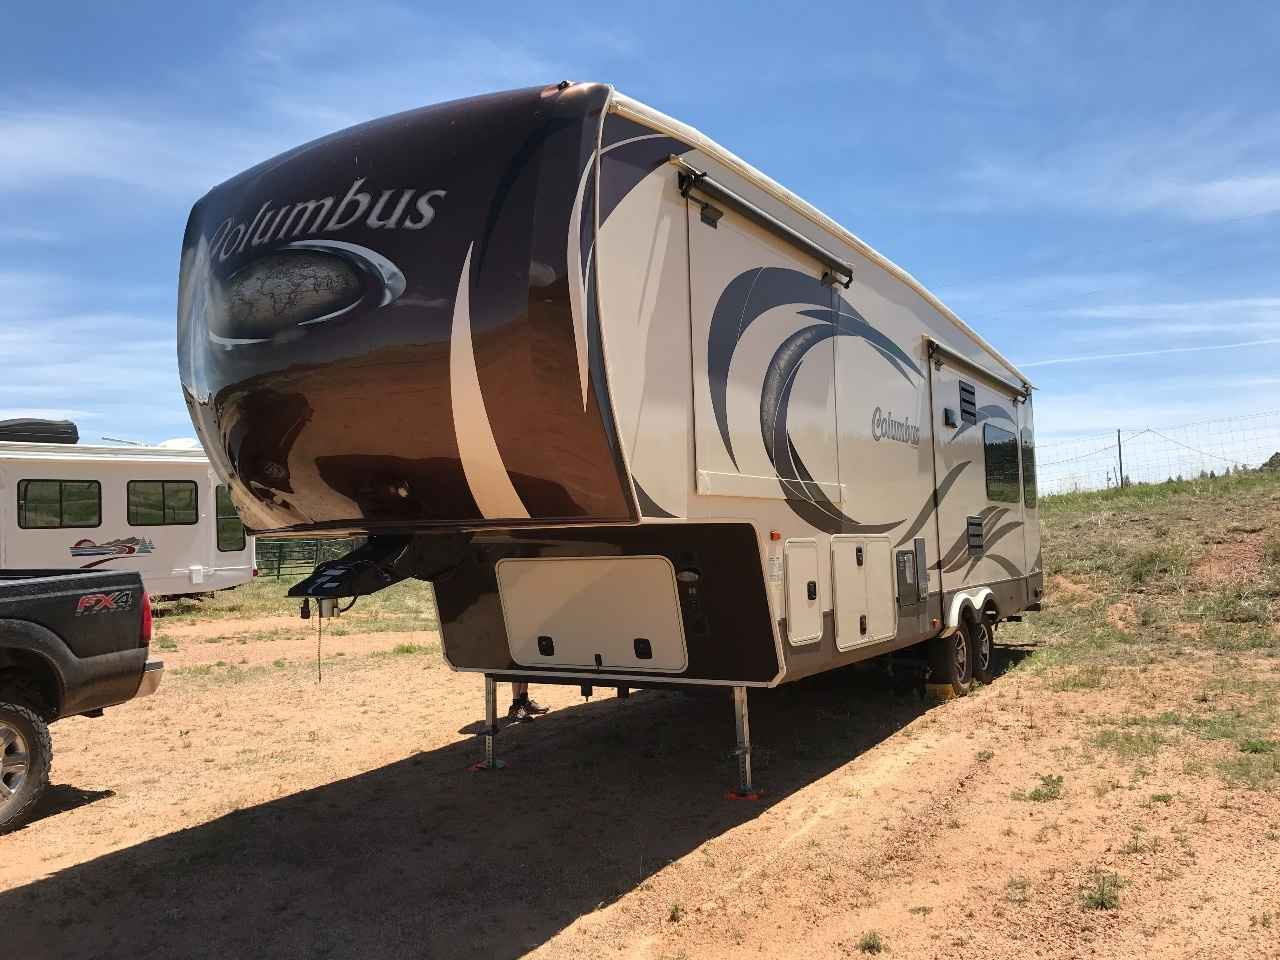 2014 Used Palomino Columbus 295rl Fifth Wheel In Colorado Co